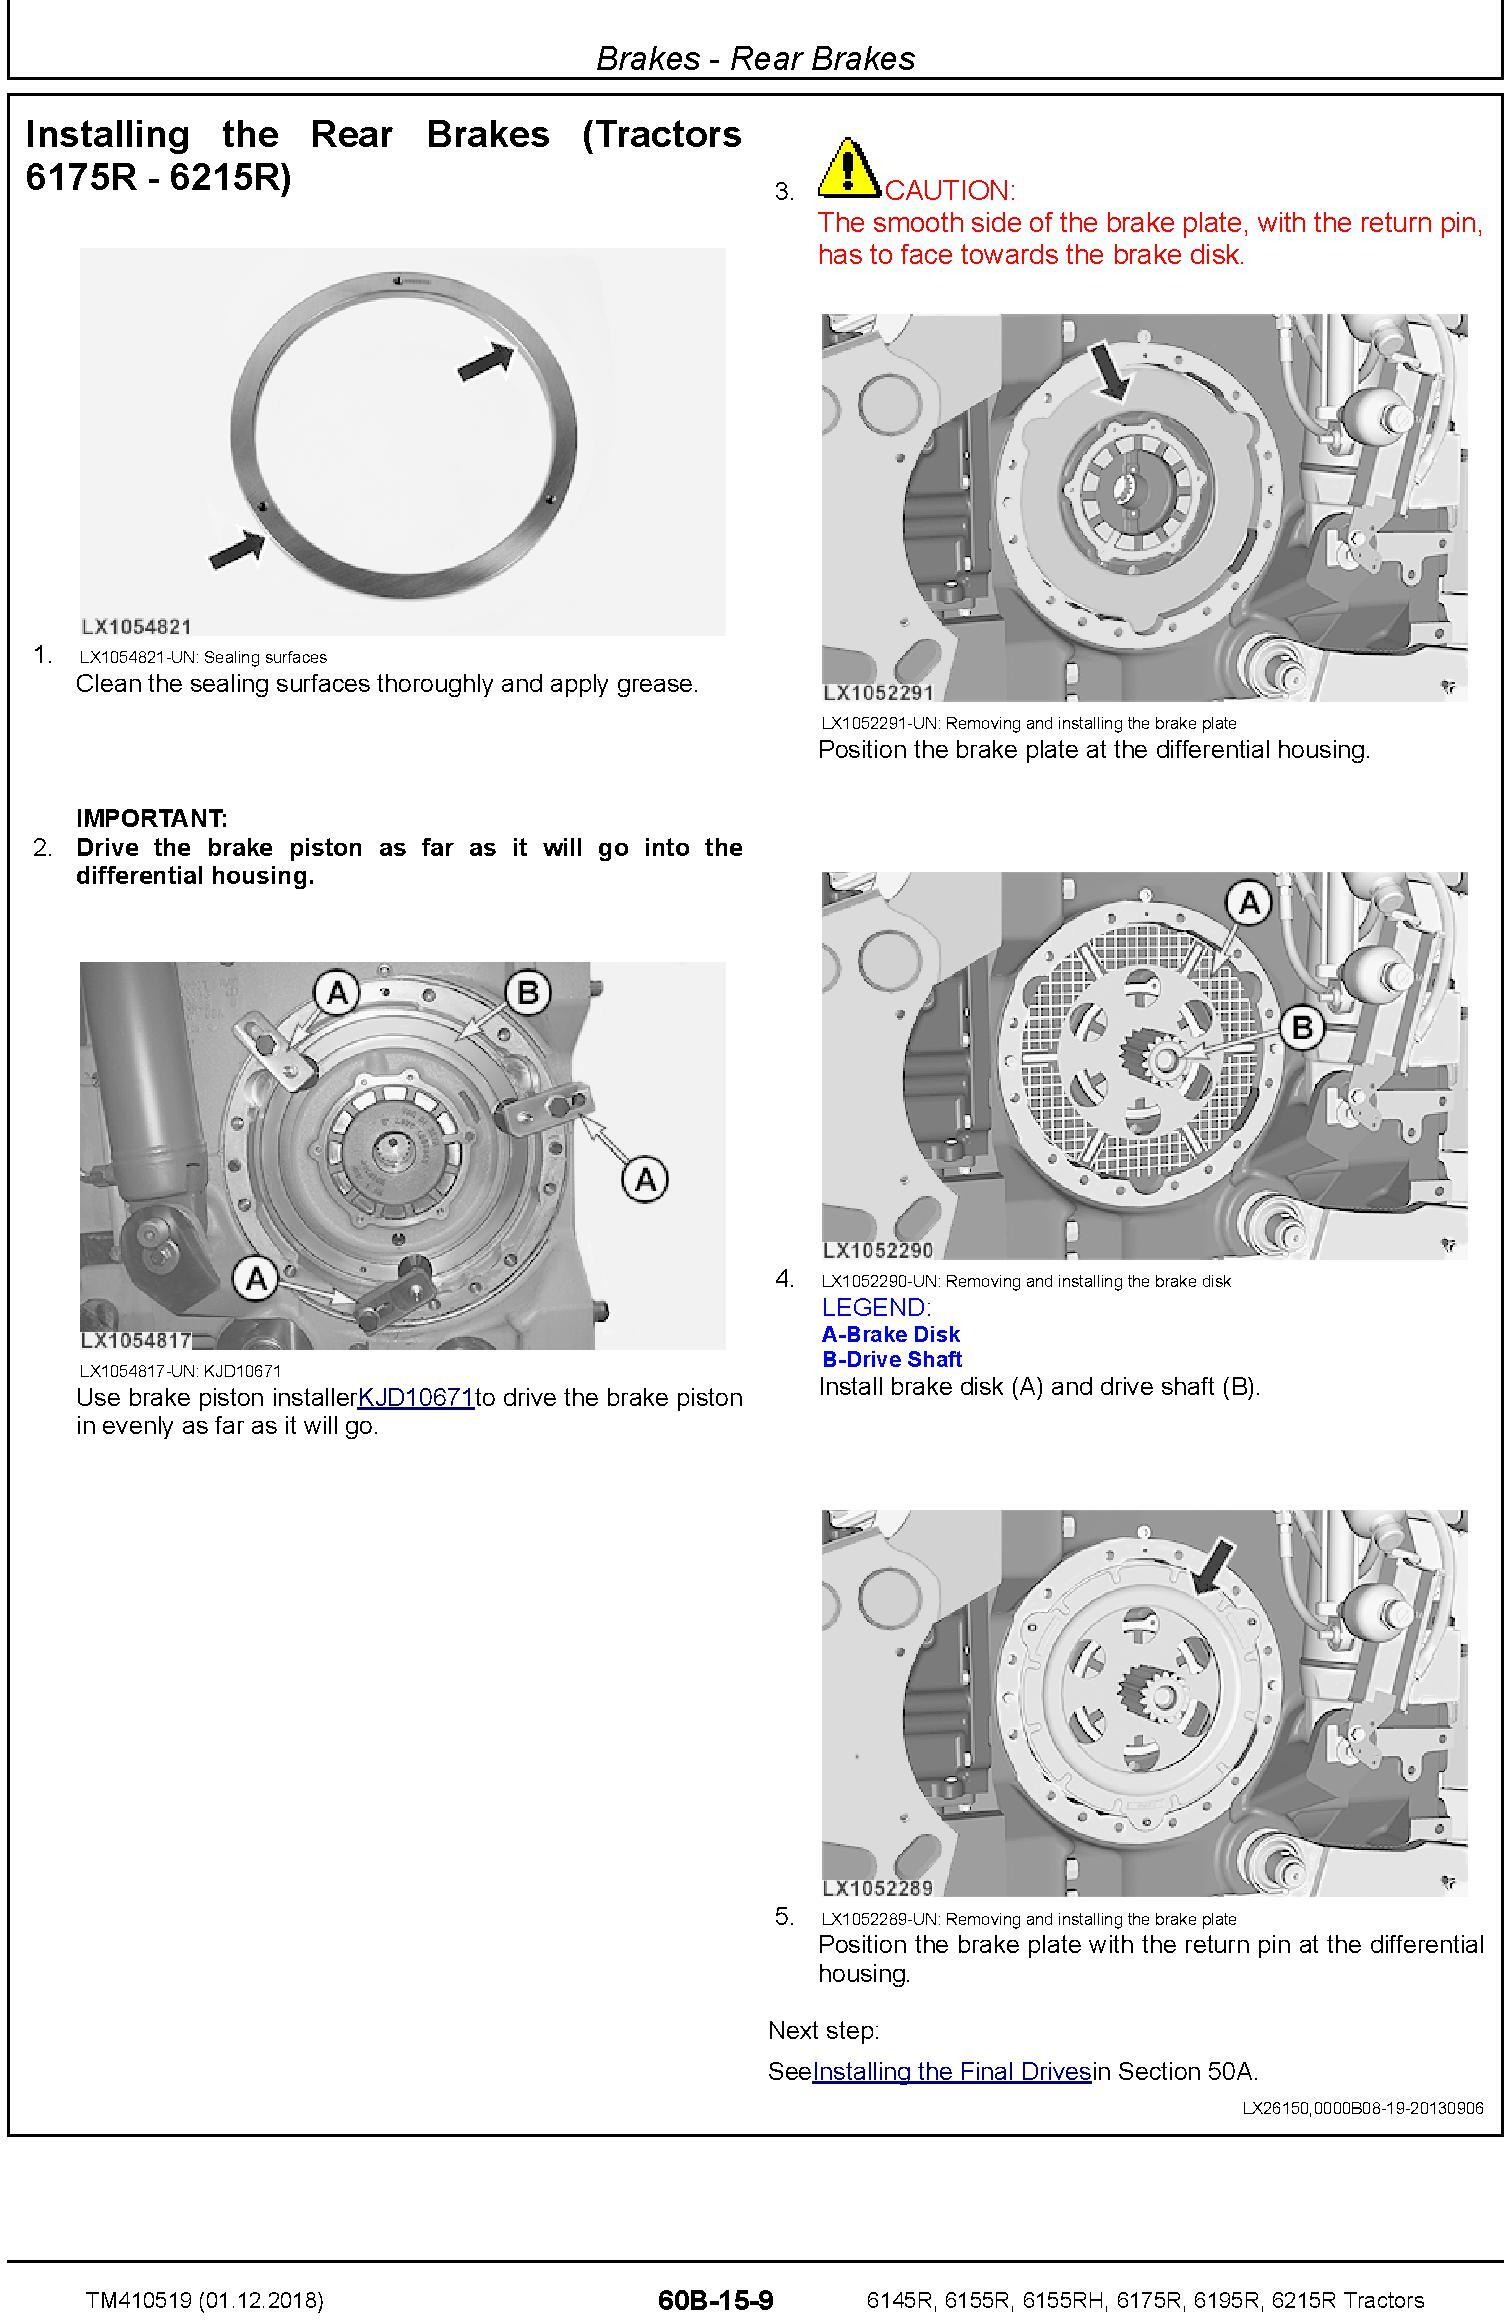 John Deere 6145R, 6155R, 6155RH, 6175R, 6195R, 6215R MY18 Tractor Repair Technical Manual (TM410519) - 2